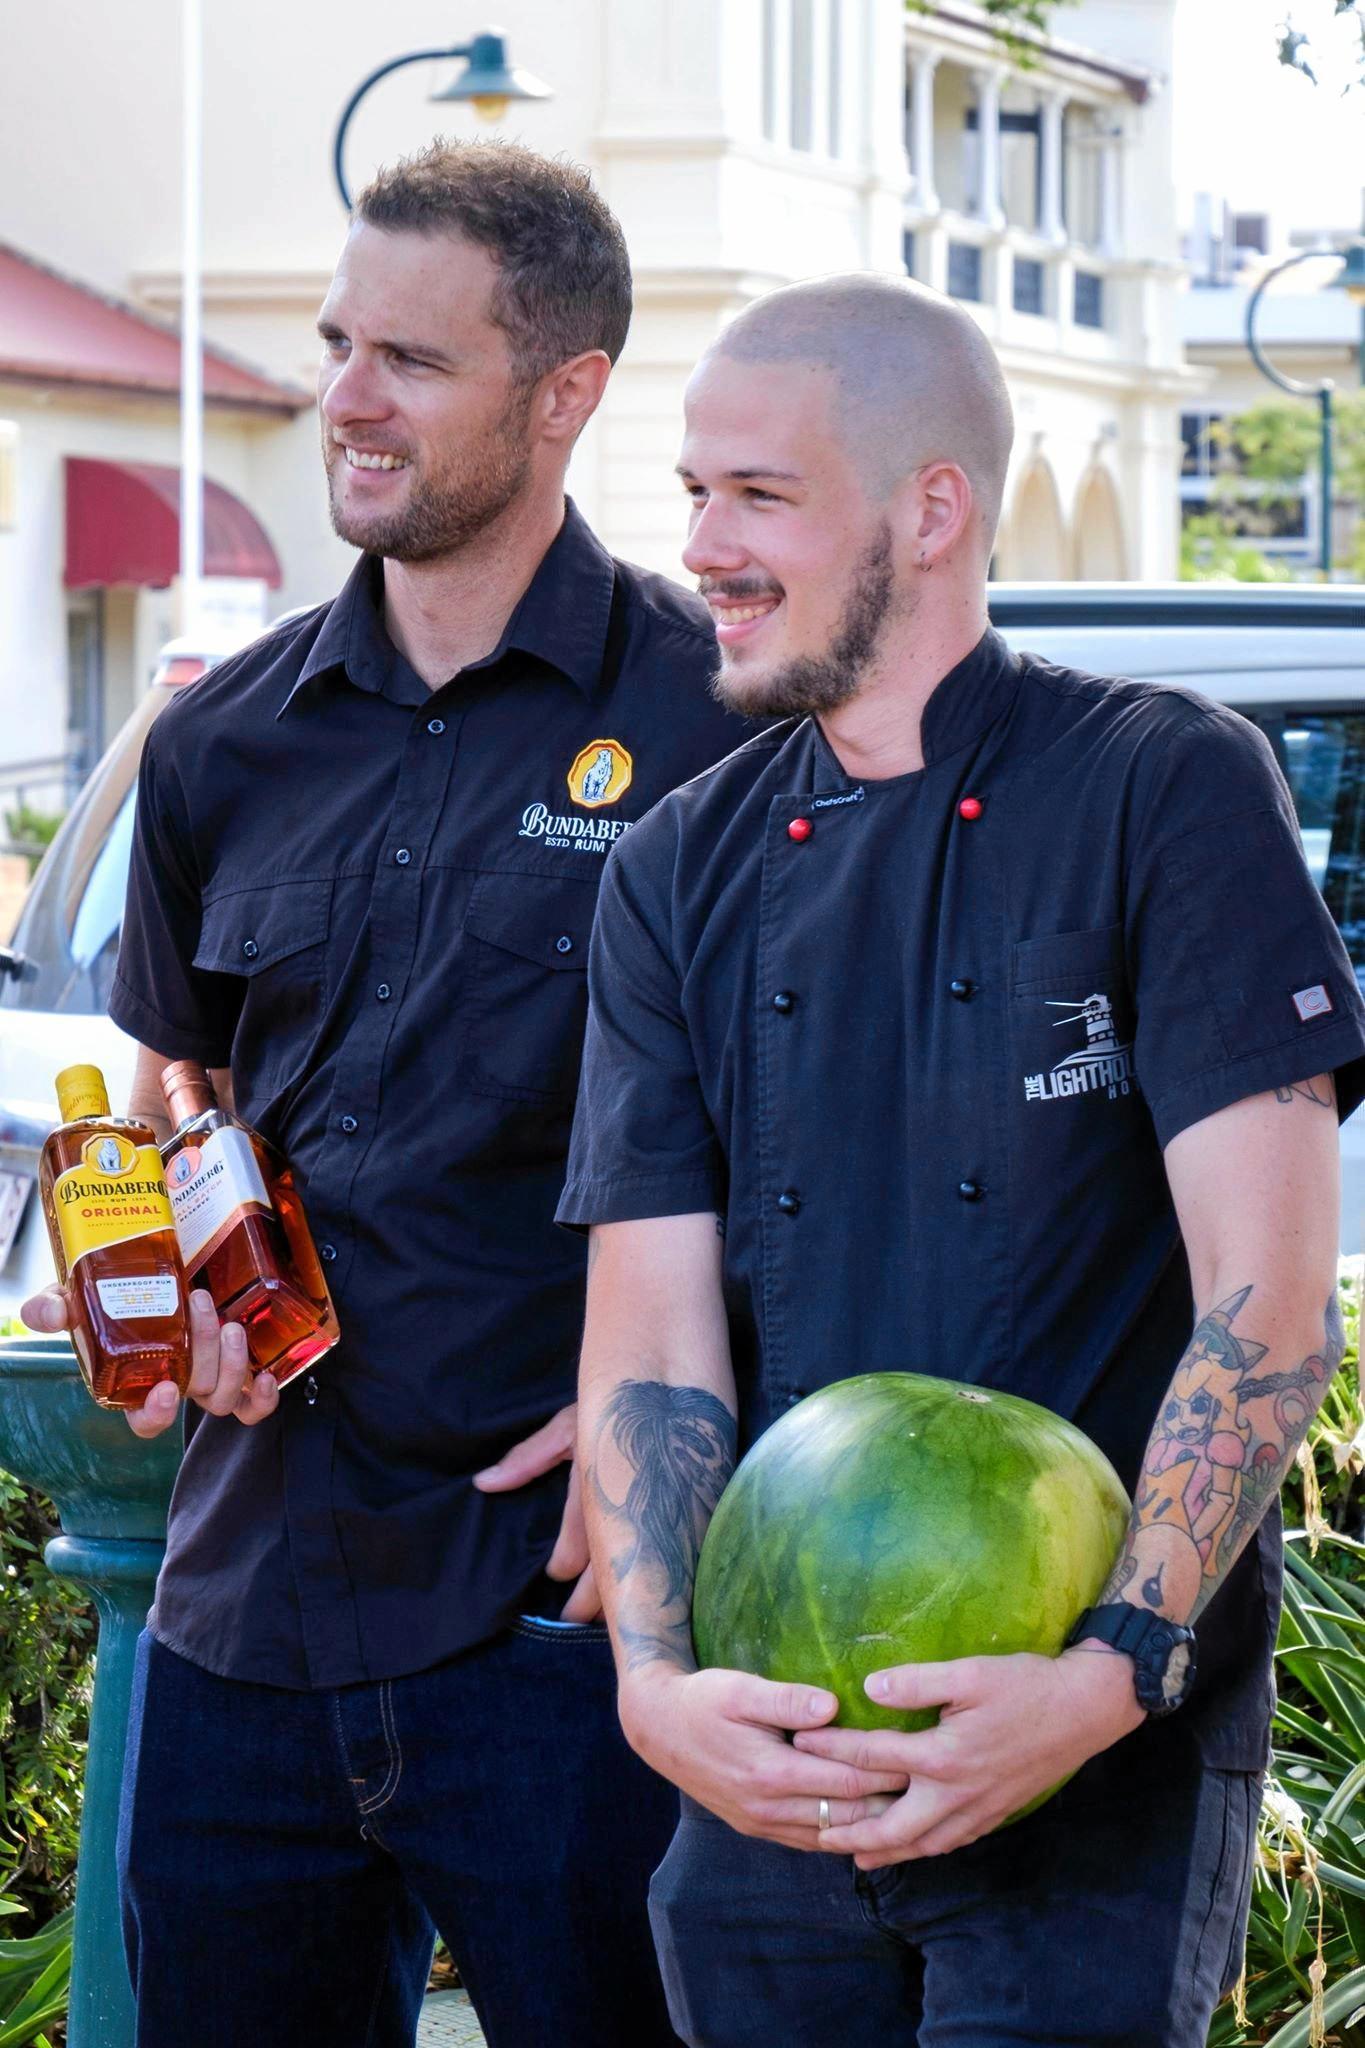 Bundaberg Rum's Scott Merrick and The Lighthouse Hotel's Matthew Buwalda are part of the Taste Bundaberg Festival.